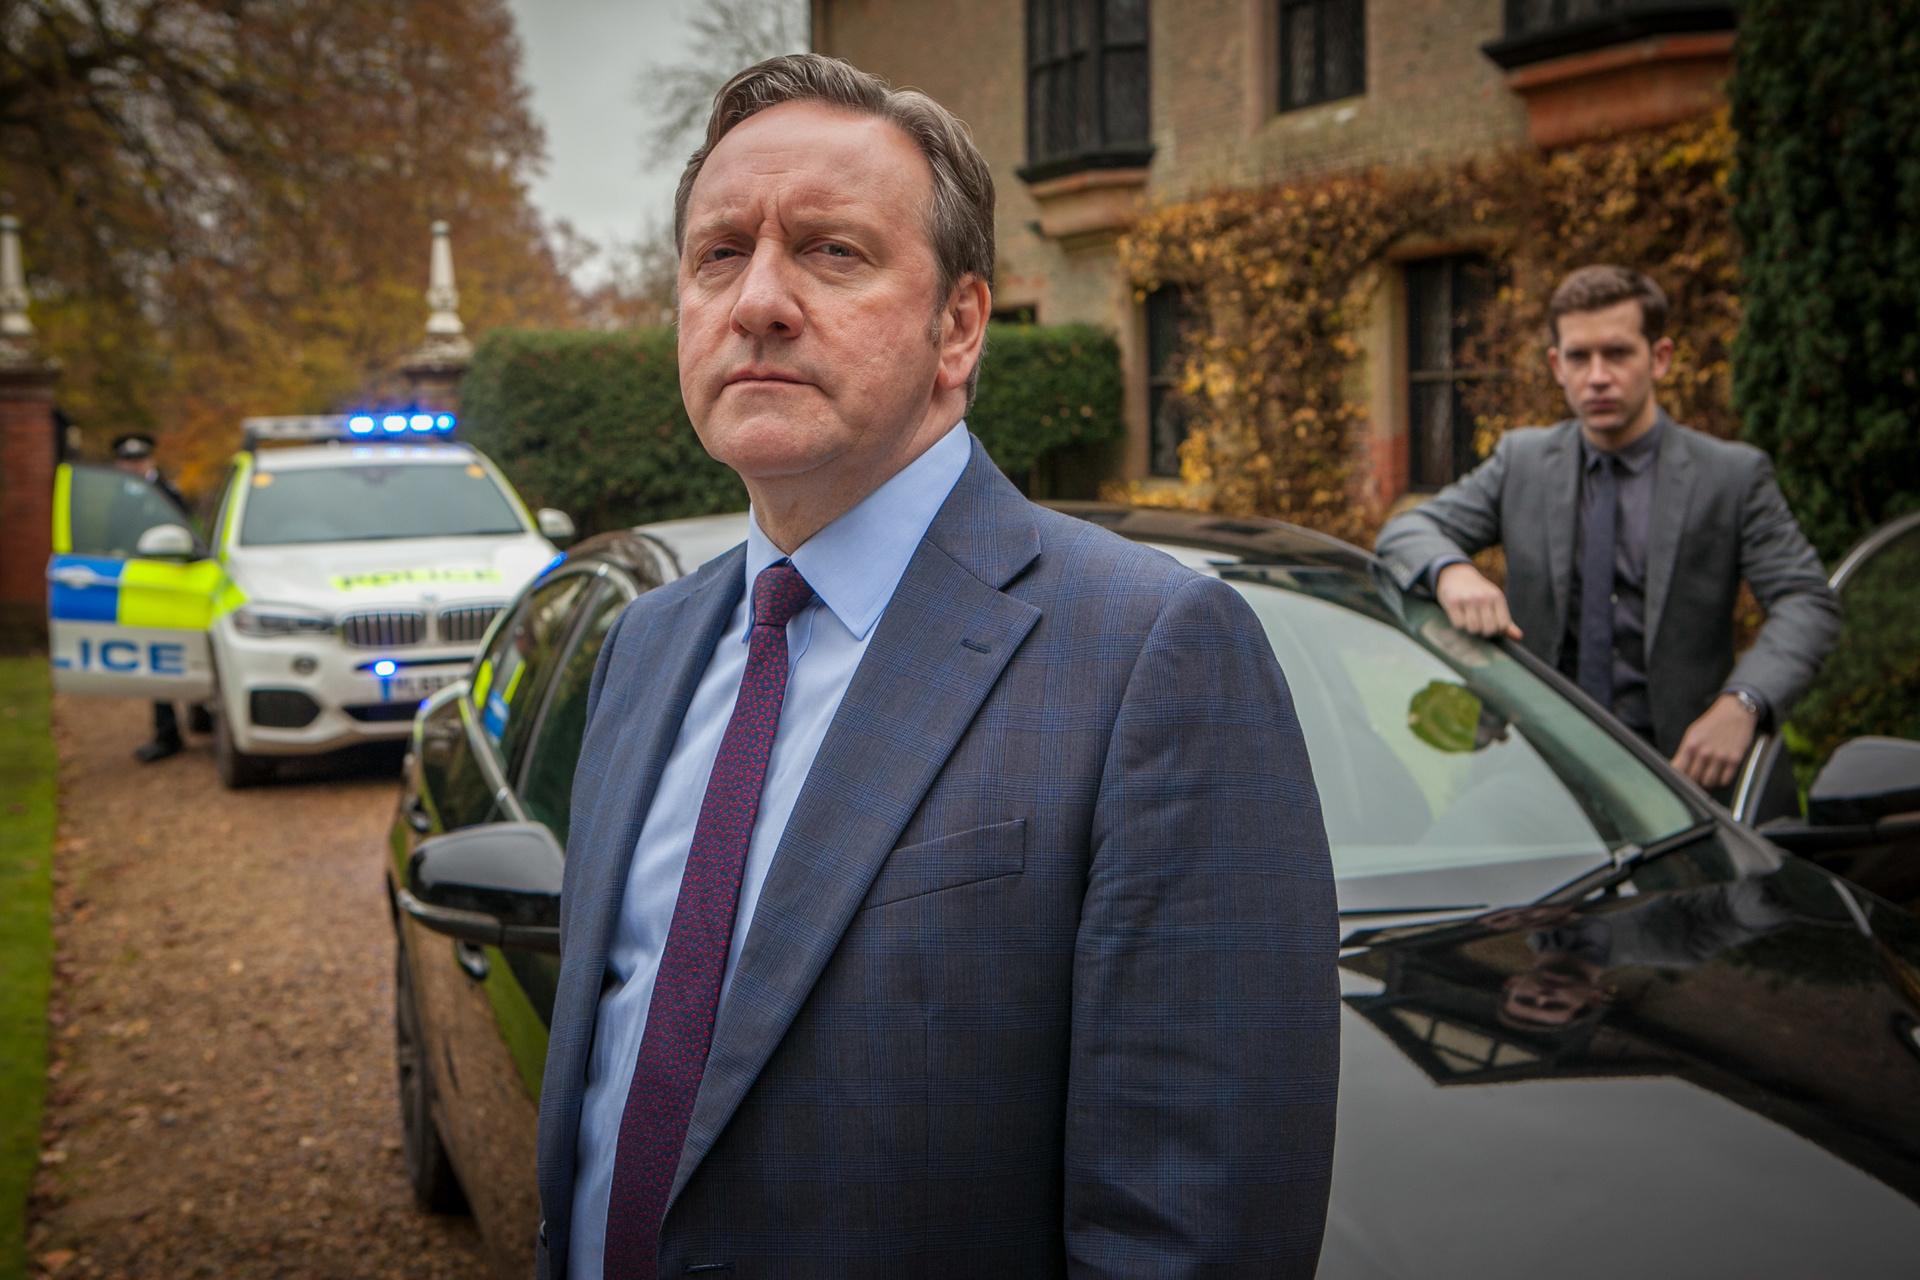 Inspector Barnaby Zdf